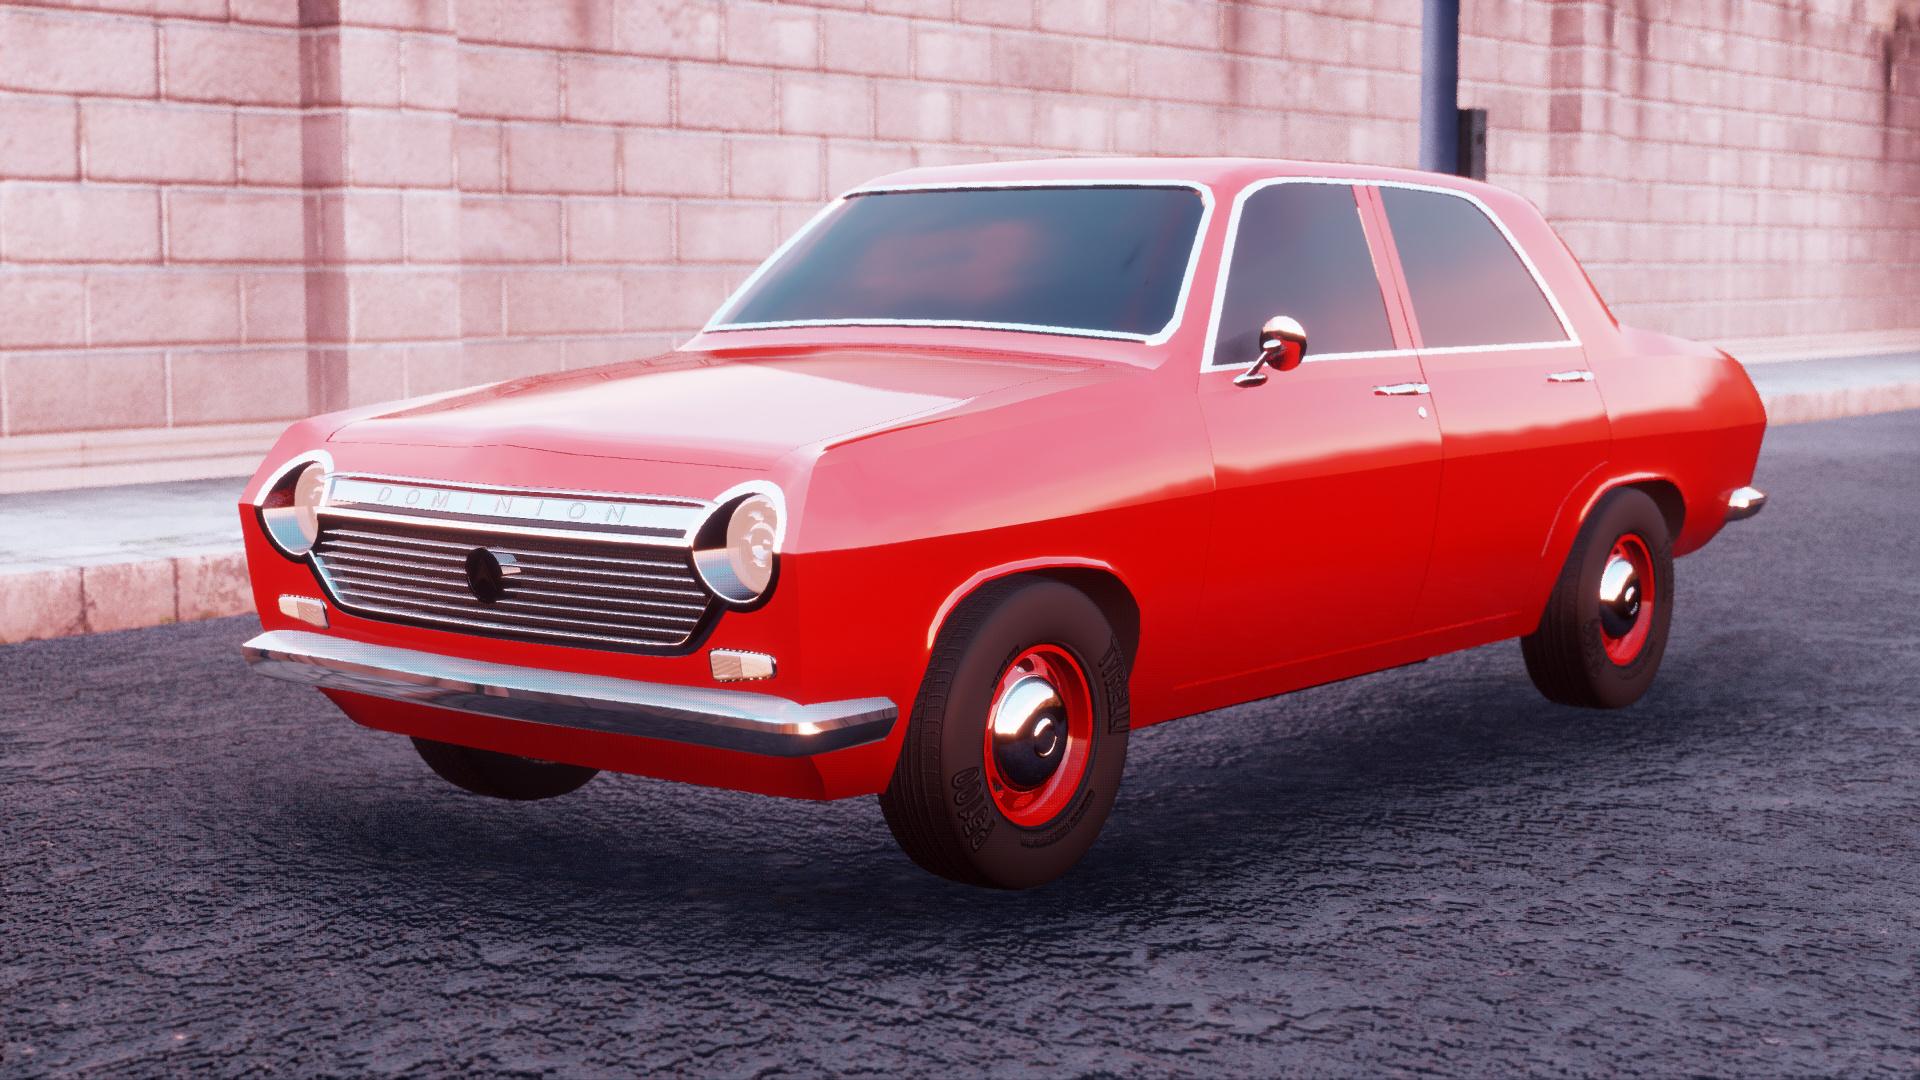 Royal Canadian Motors (RCM) - Car Design Sharing Forum - Automation